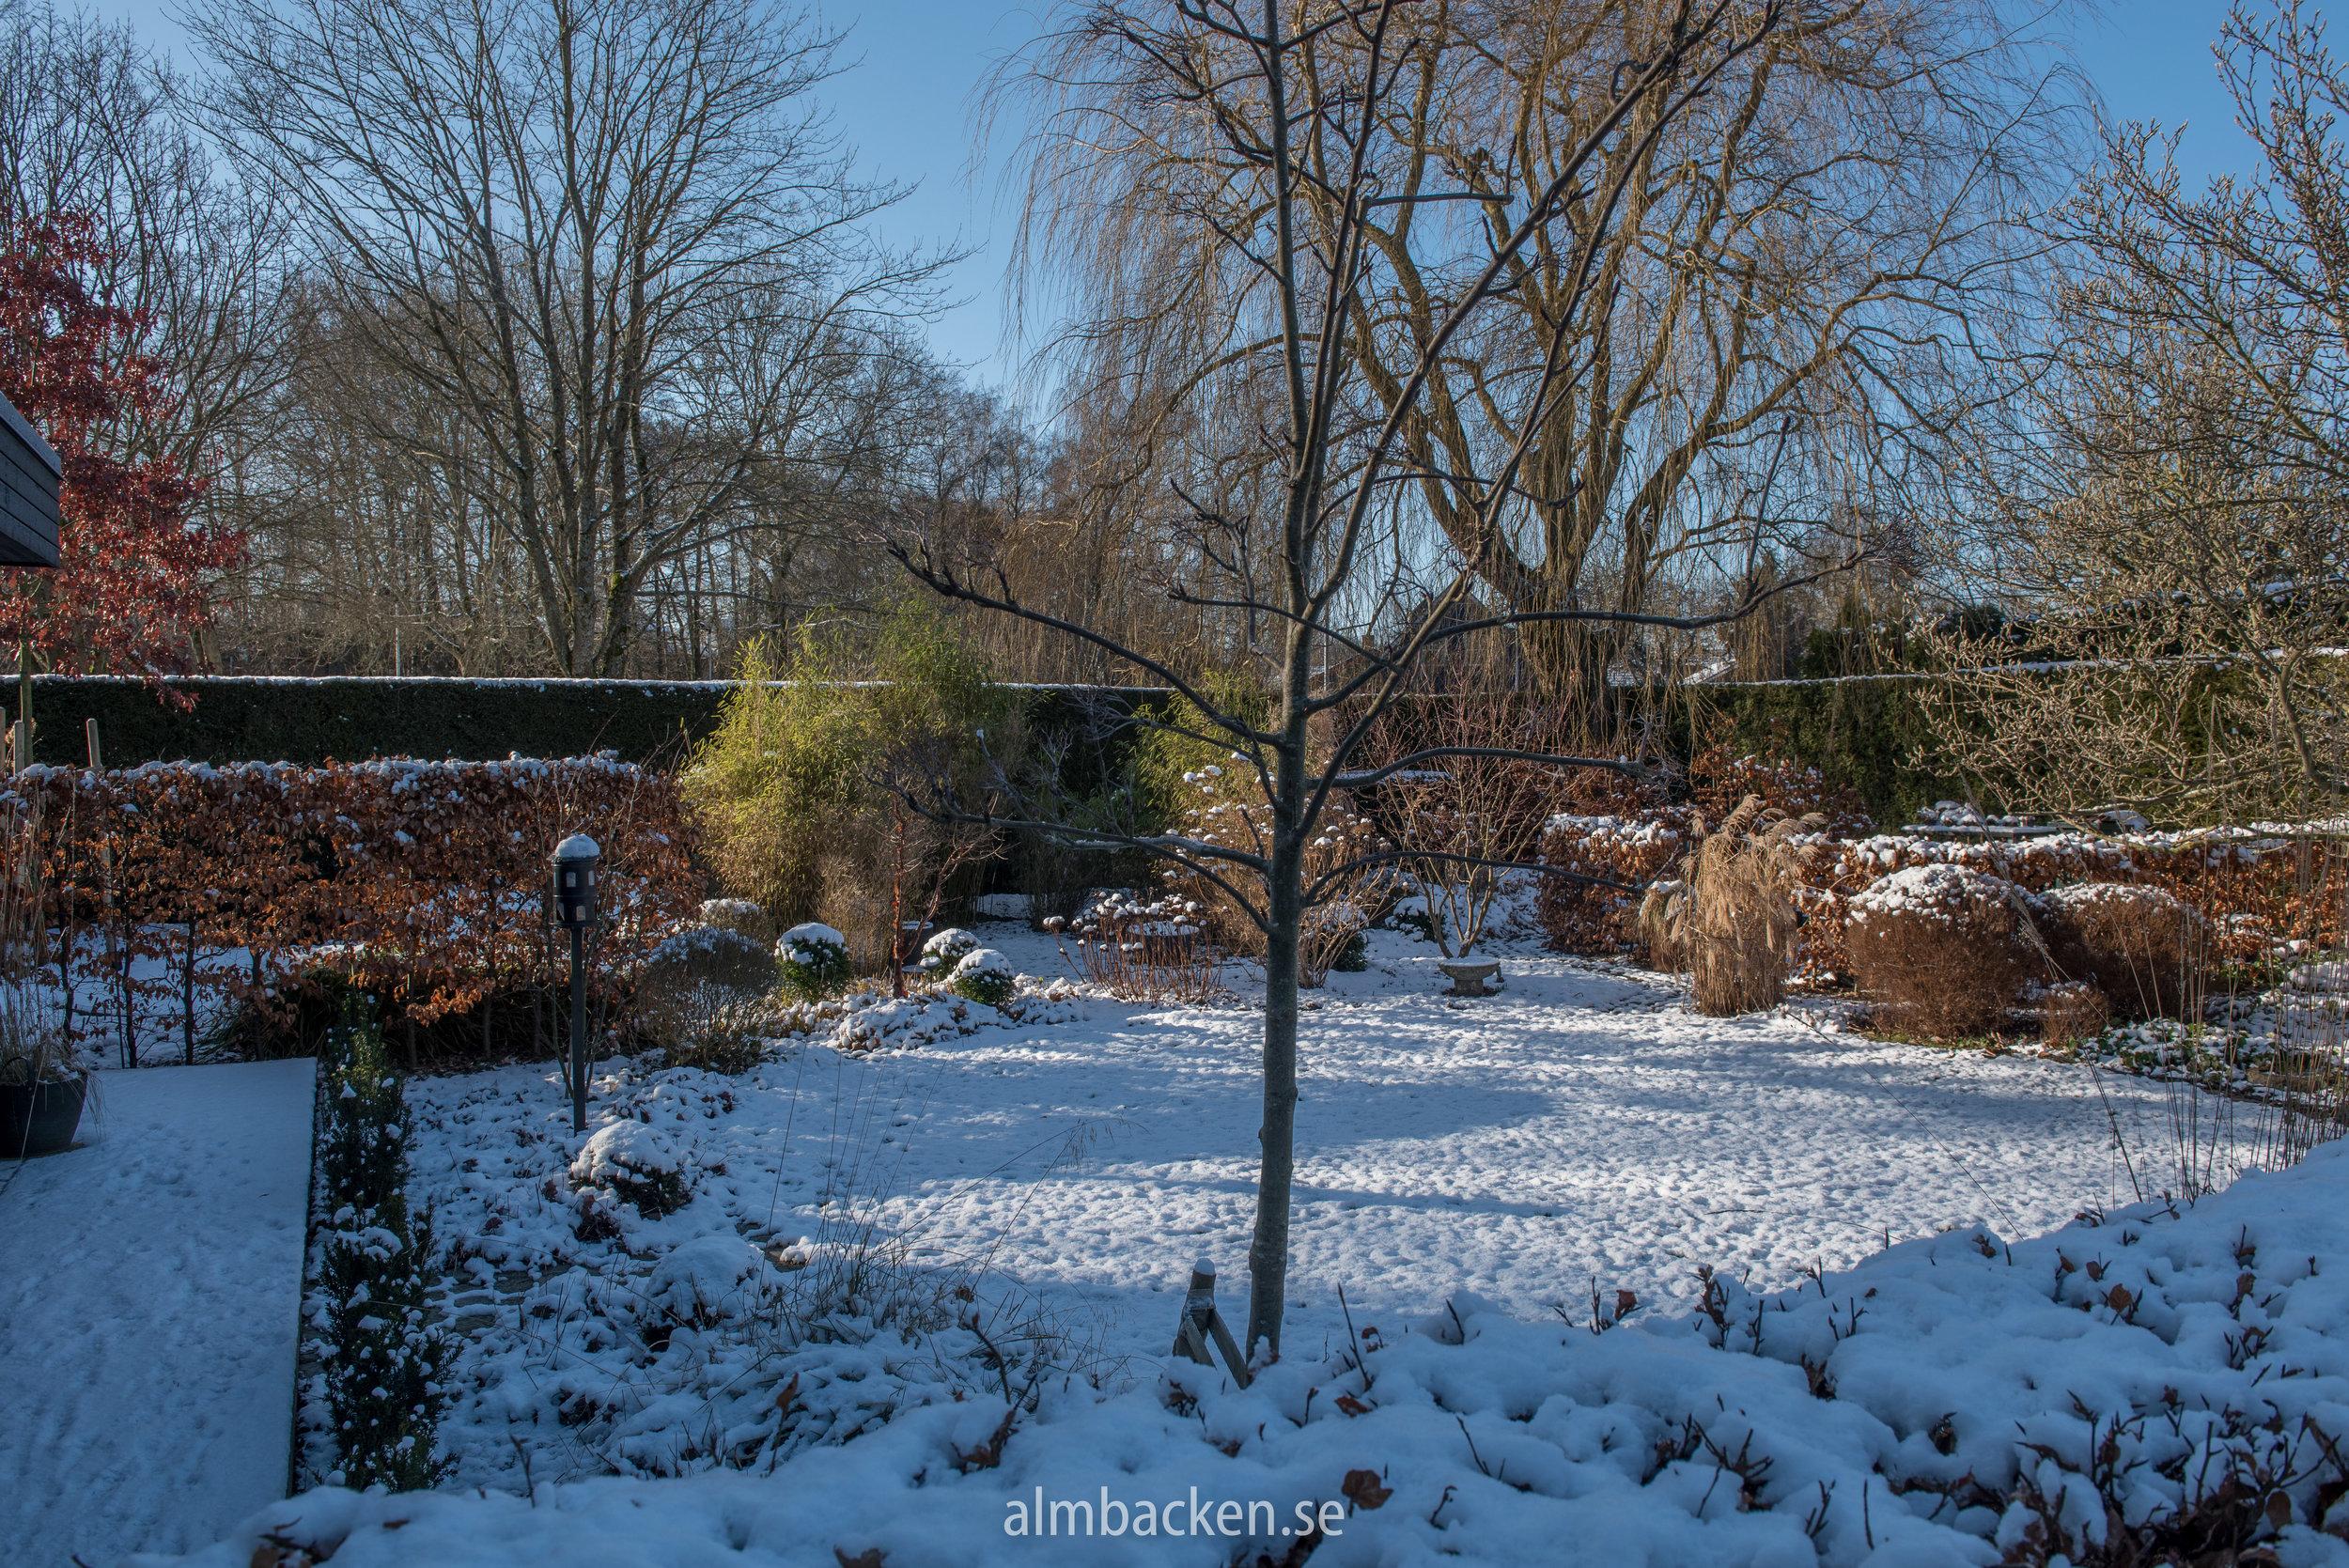 Almbacken-magnolia-bambu-kopparlönn-ullungrönn-schalrakansek6.jpg